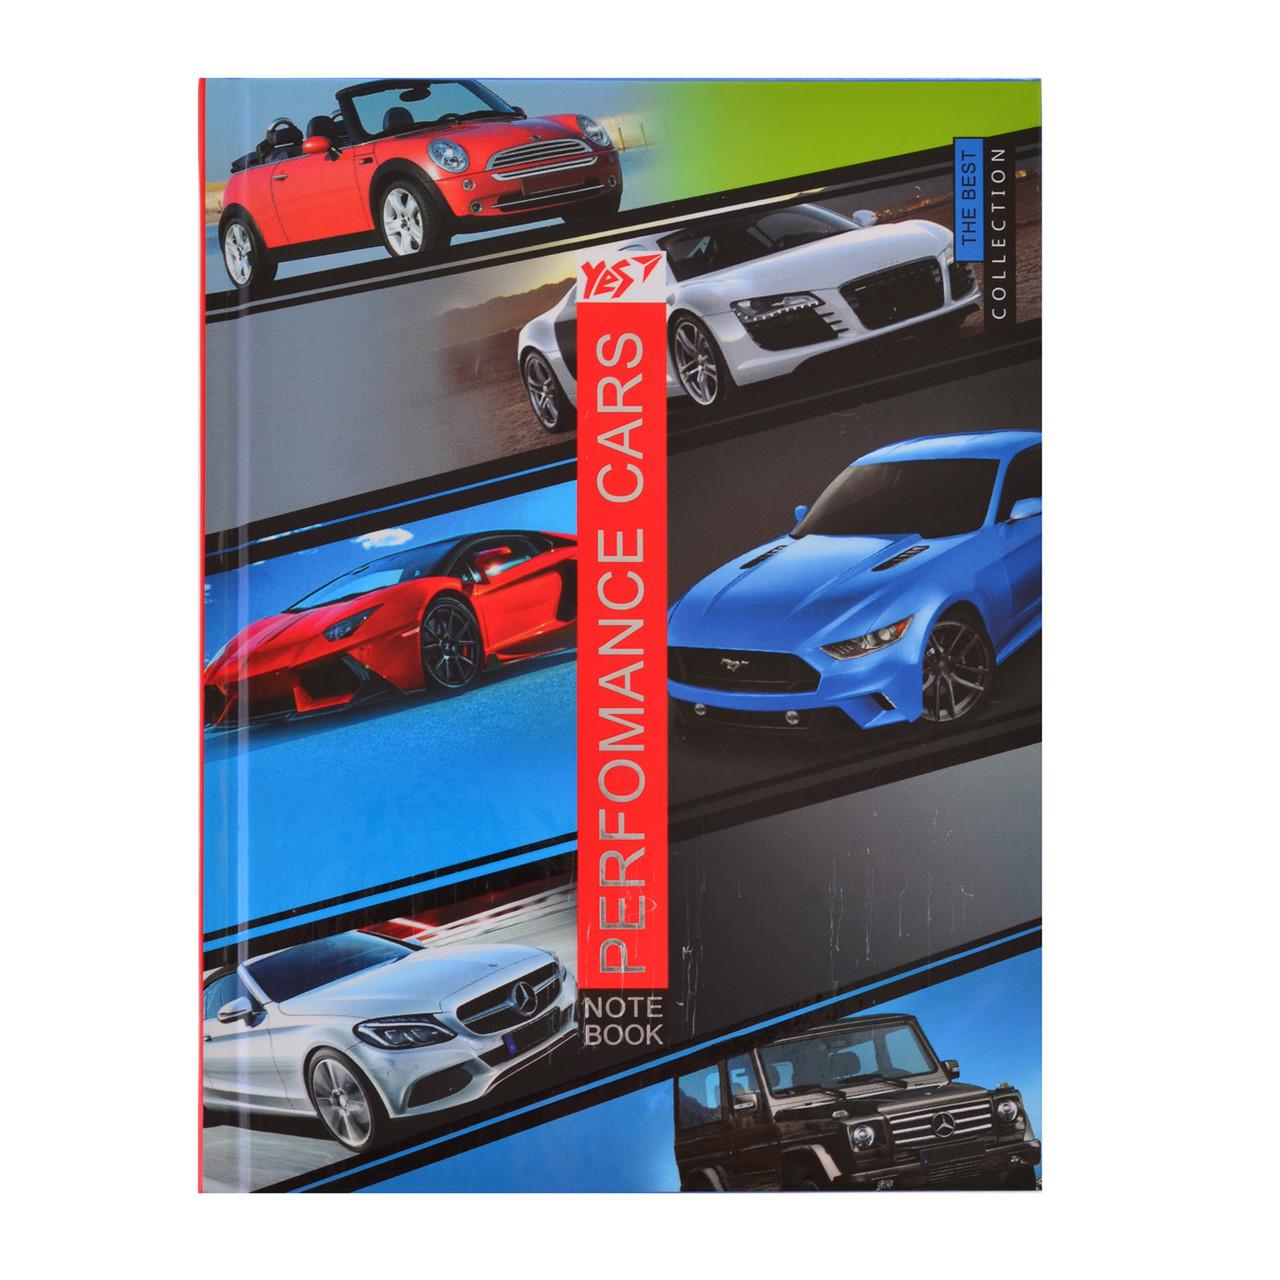 Блокнот 140*185/96 КЛ. 7БЦ Perfomance cars YES код: 151469